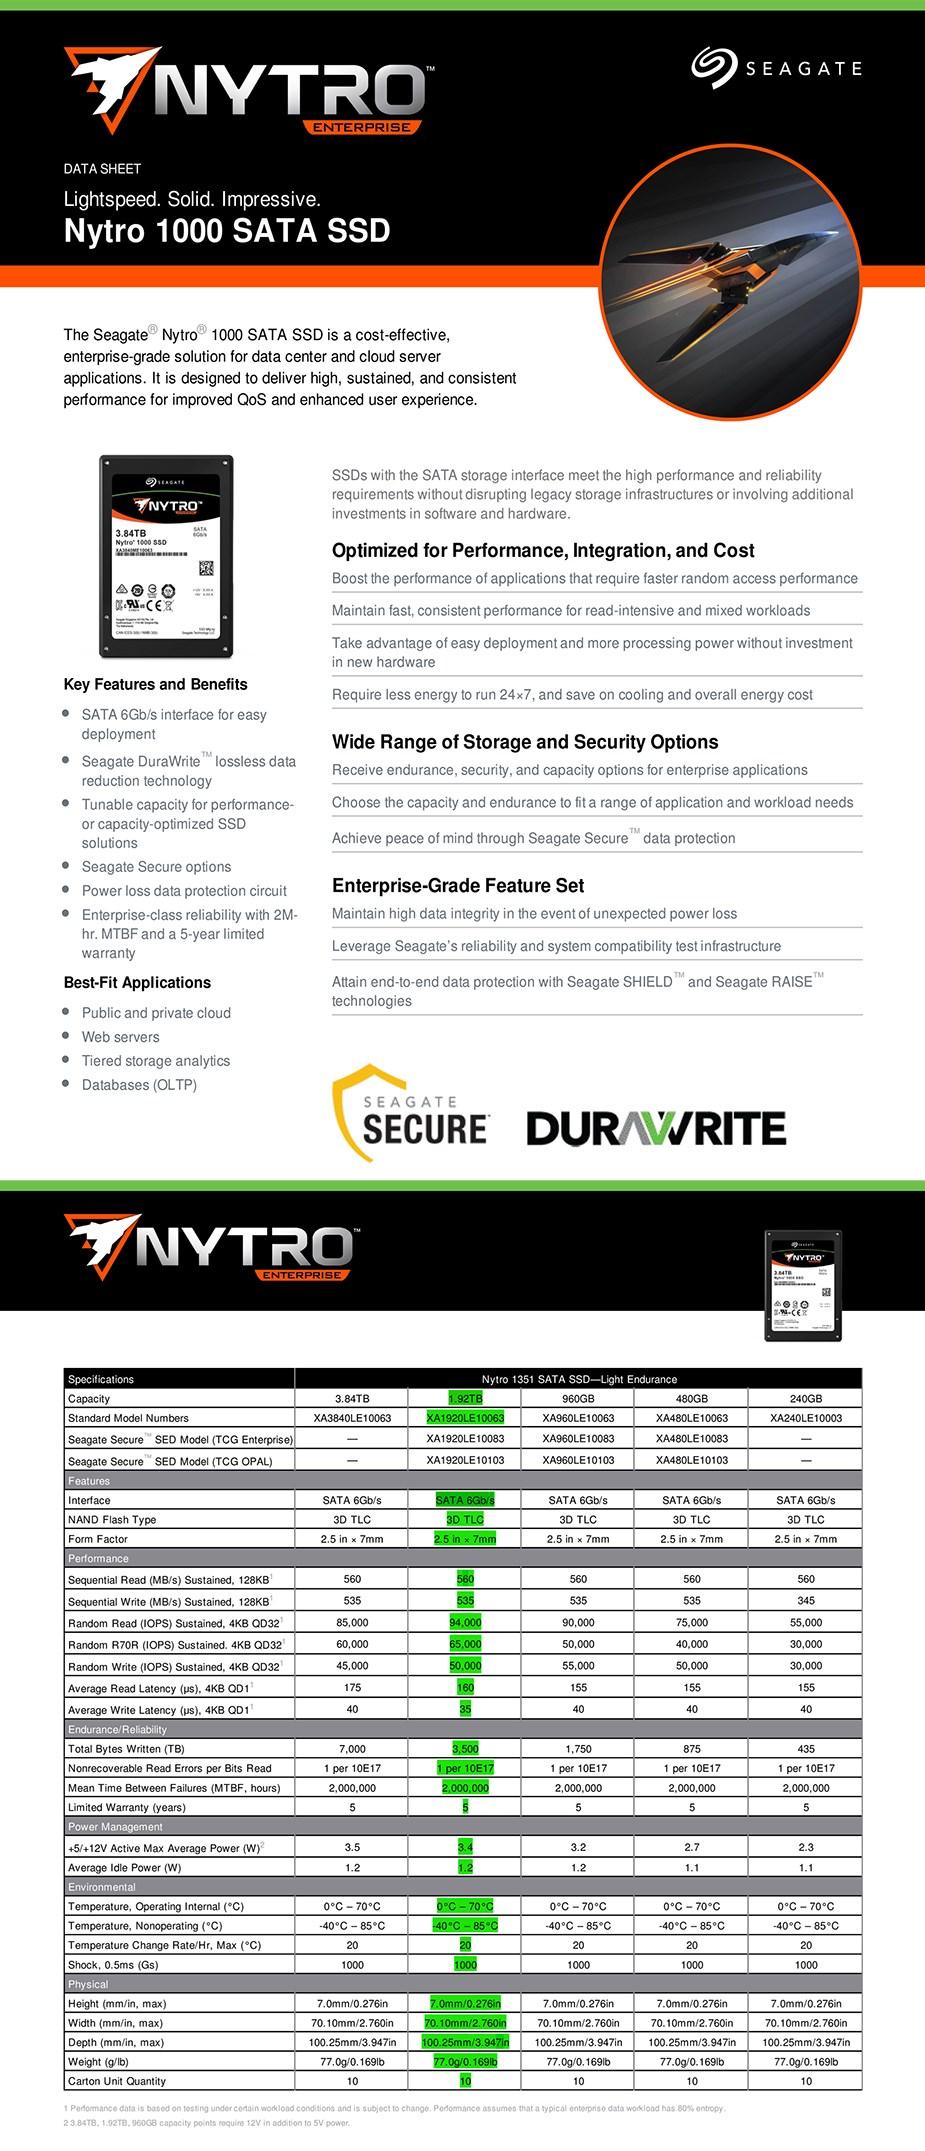 seagate-nytro-1351-xa1920le10063-192tb-25-sata-enterprise-ssd-ac35269-2.jpg